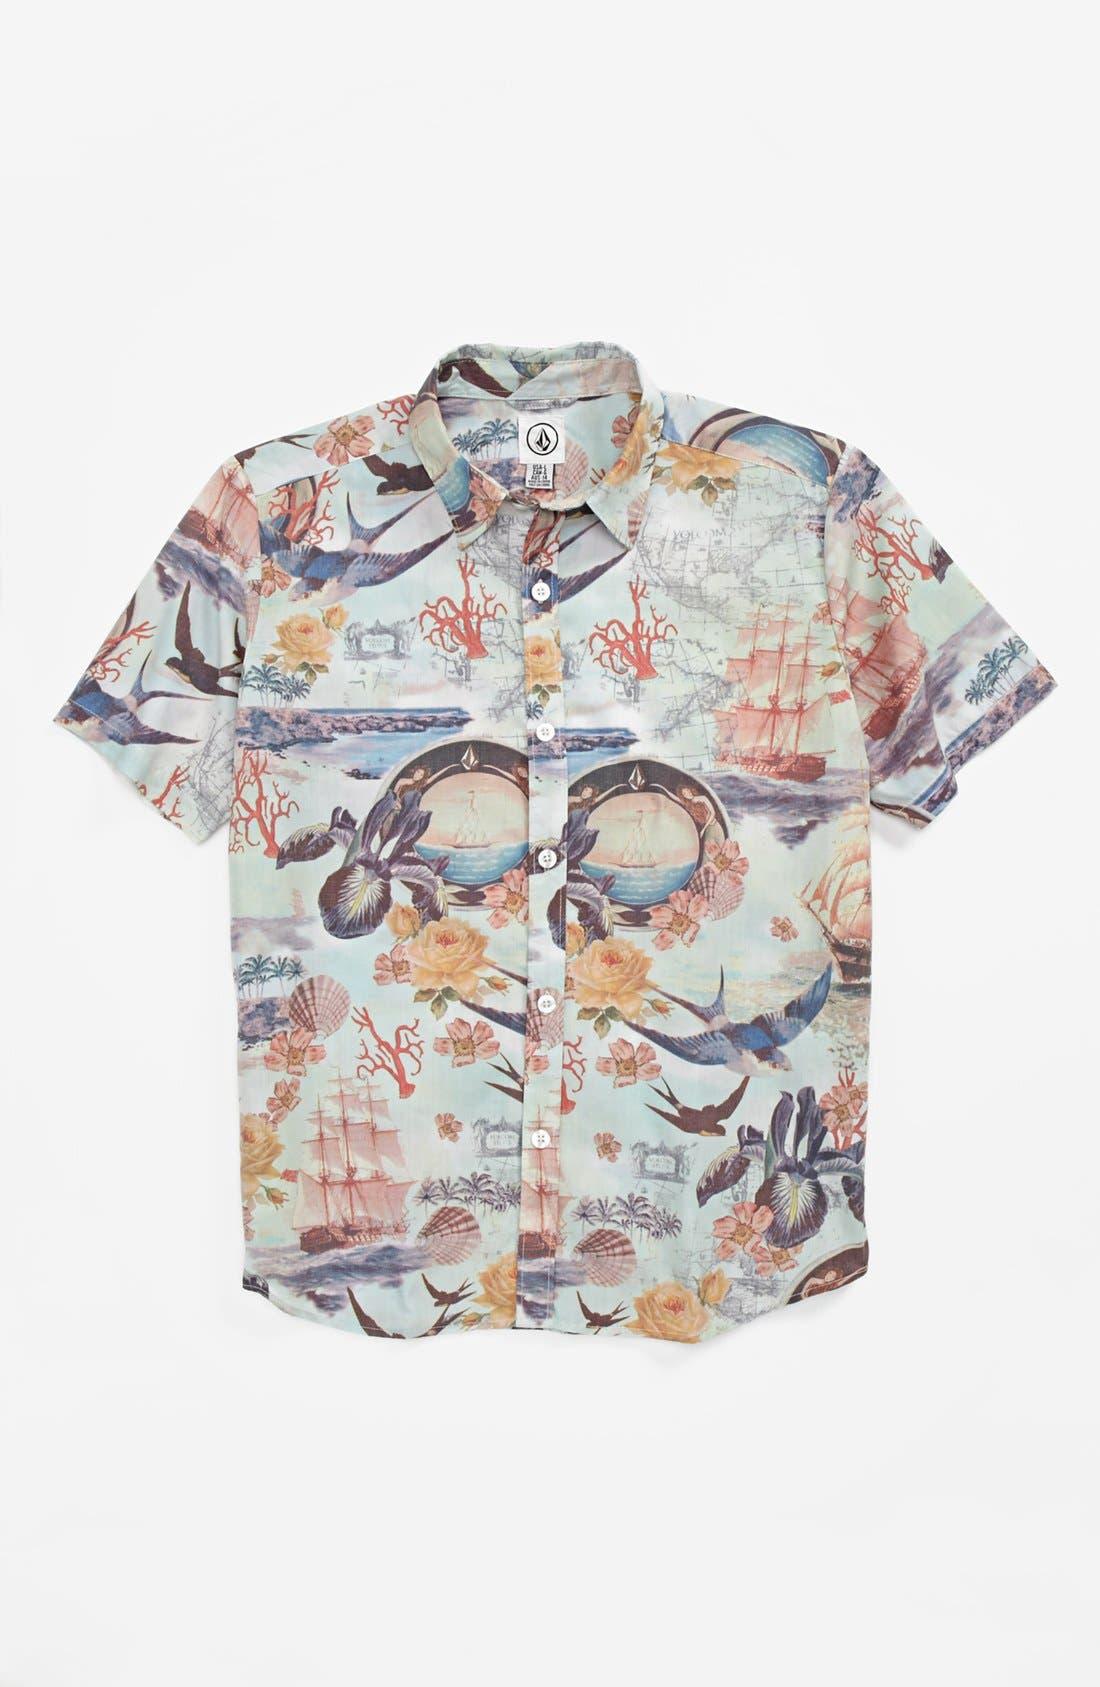 Alternate Image 1 Selected - Volcom 'Ol' Shipster' Short Sleeve Sport Shirt (Big Boys)